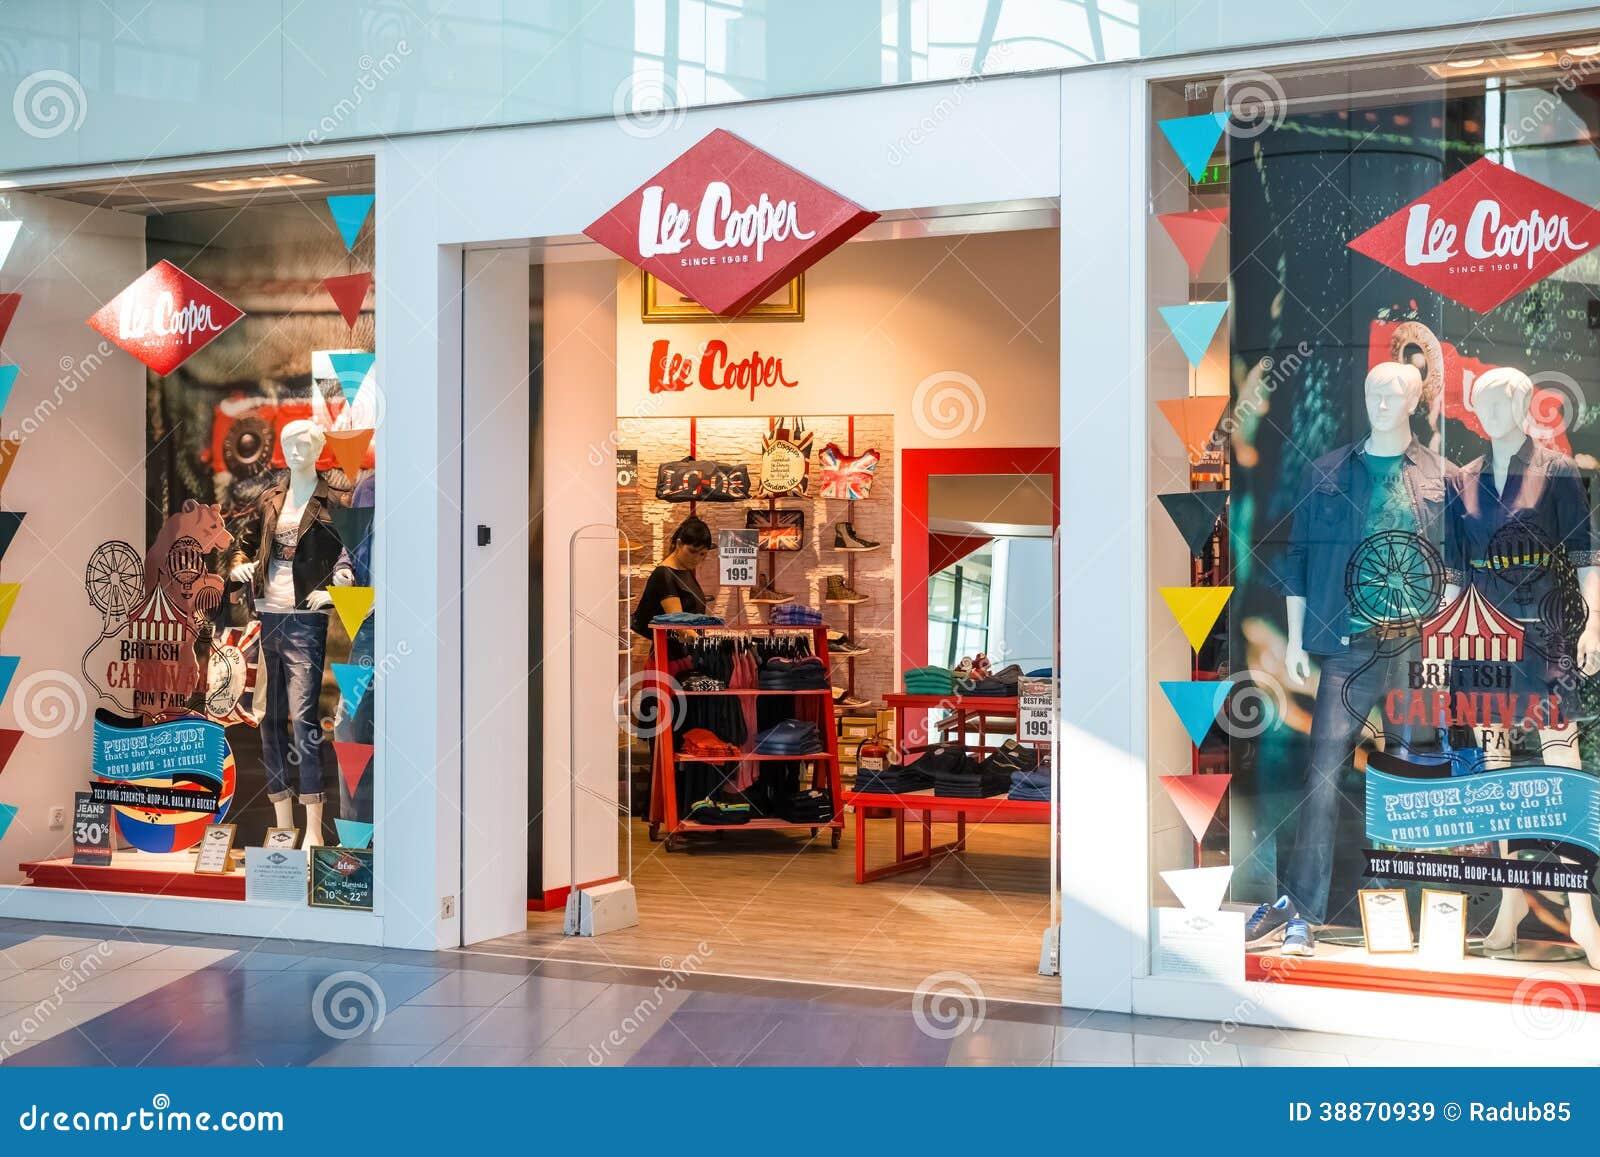 Splash clothing store. Cheap clothing stores